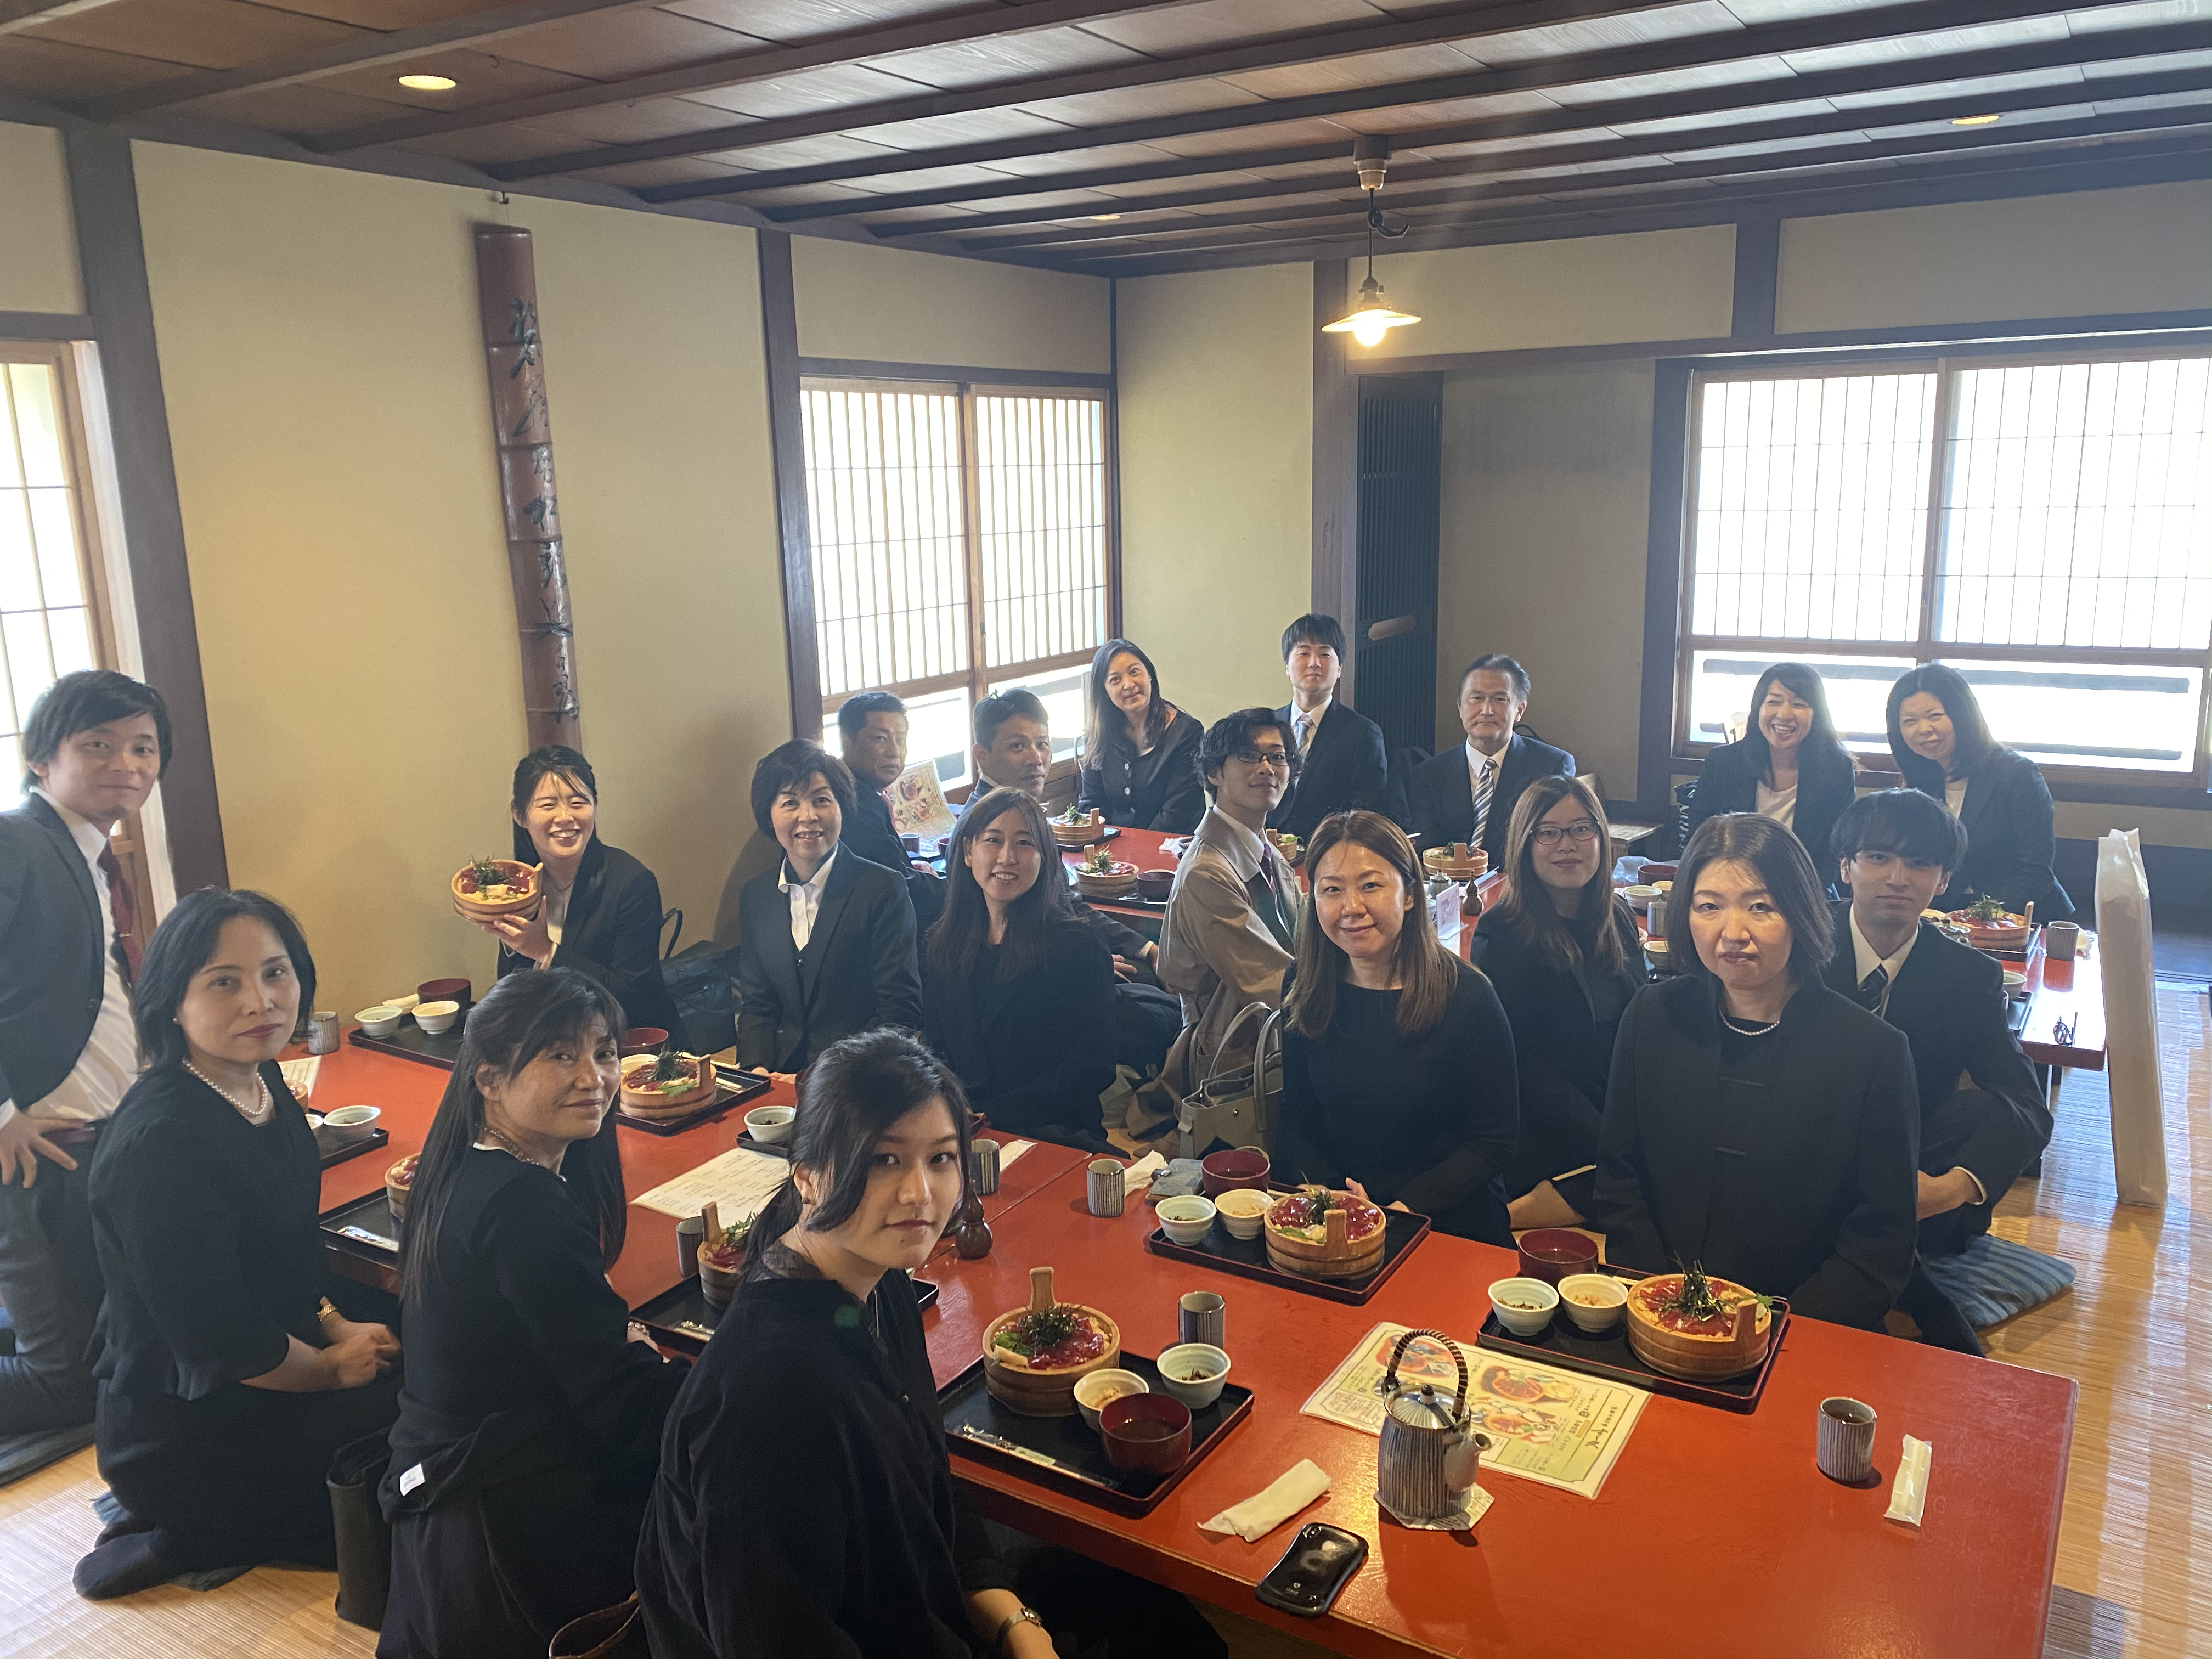 伊勢神宮参拝の食事風景